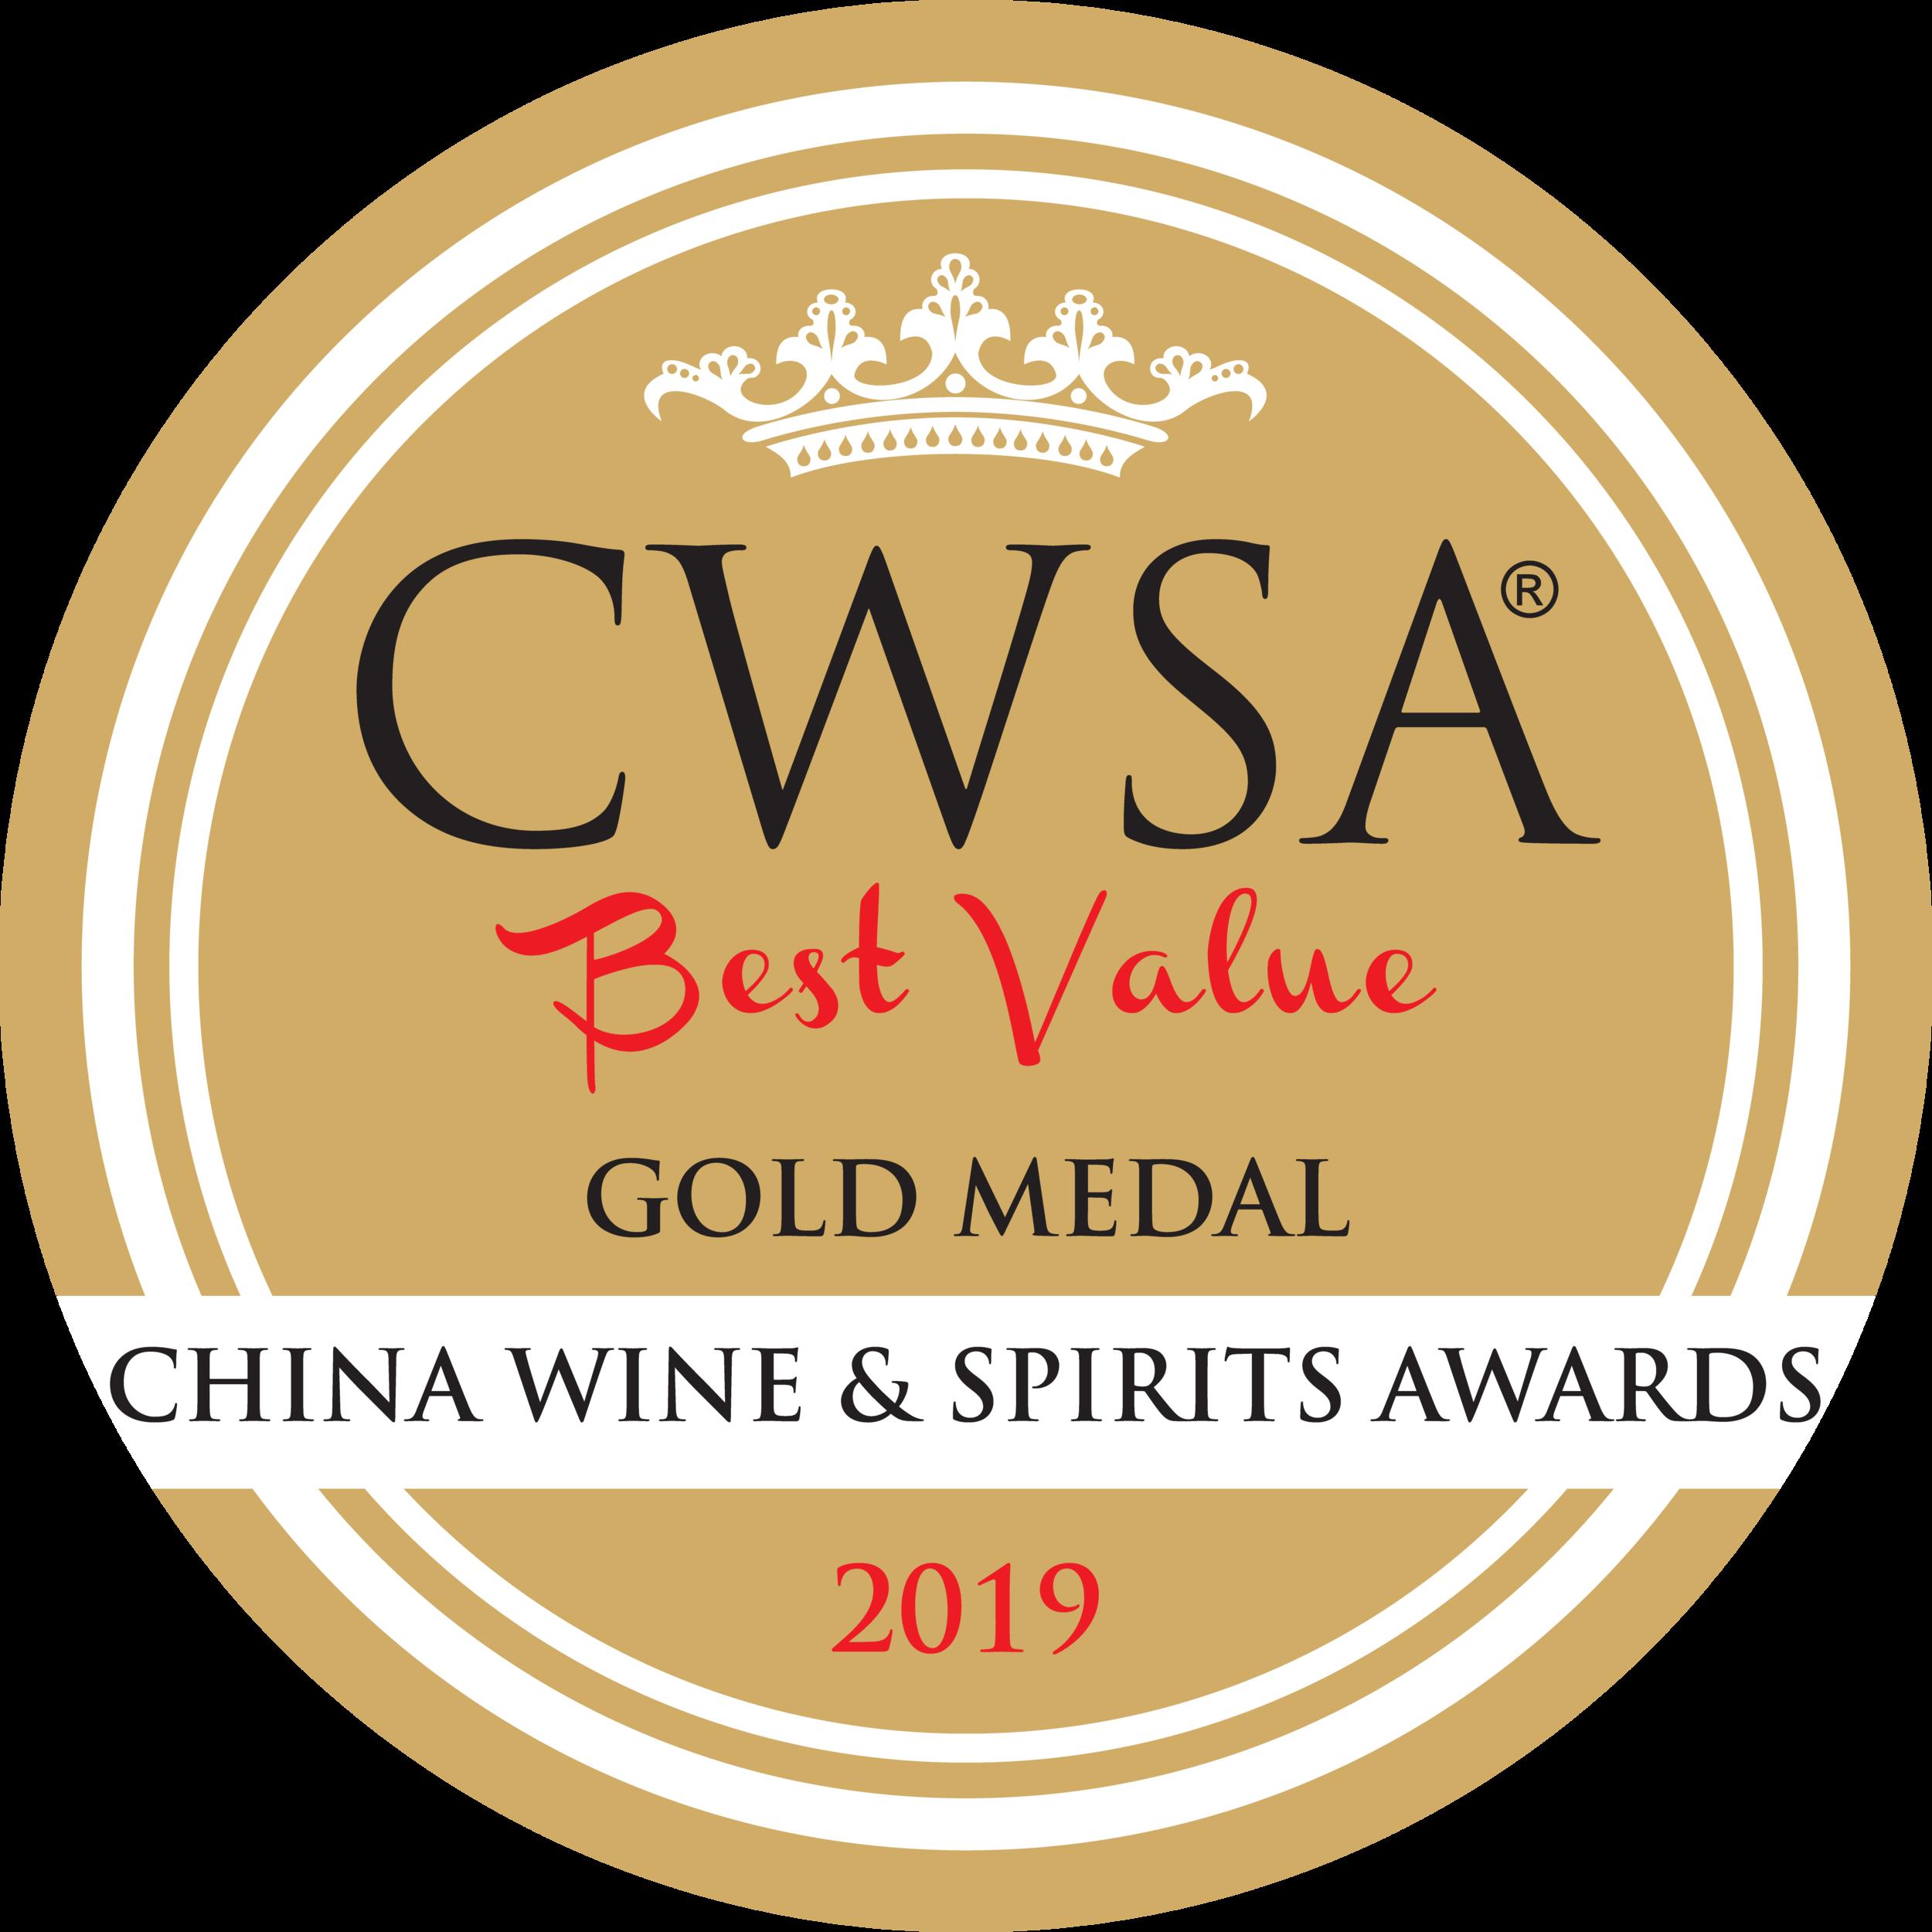 Peru 2004 : China Wine & Spirits Awards 2019, Gold Medal, China